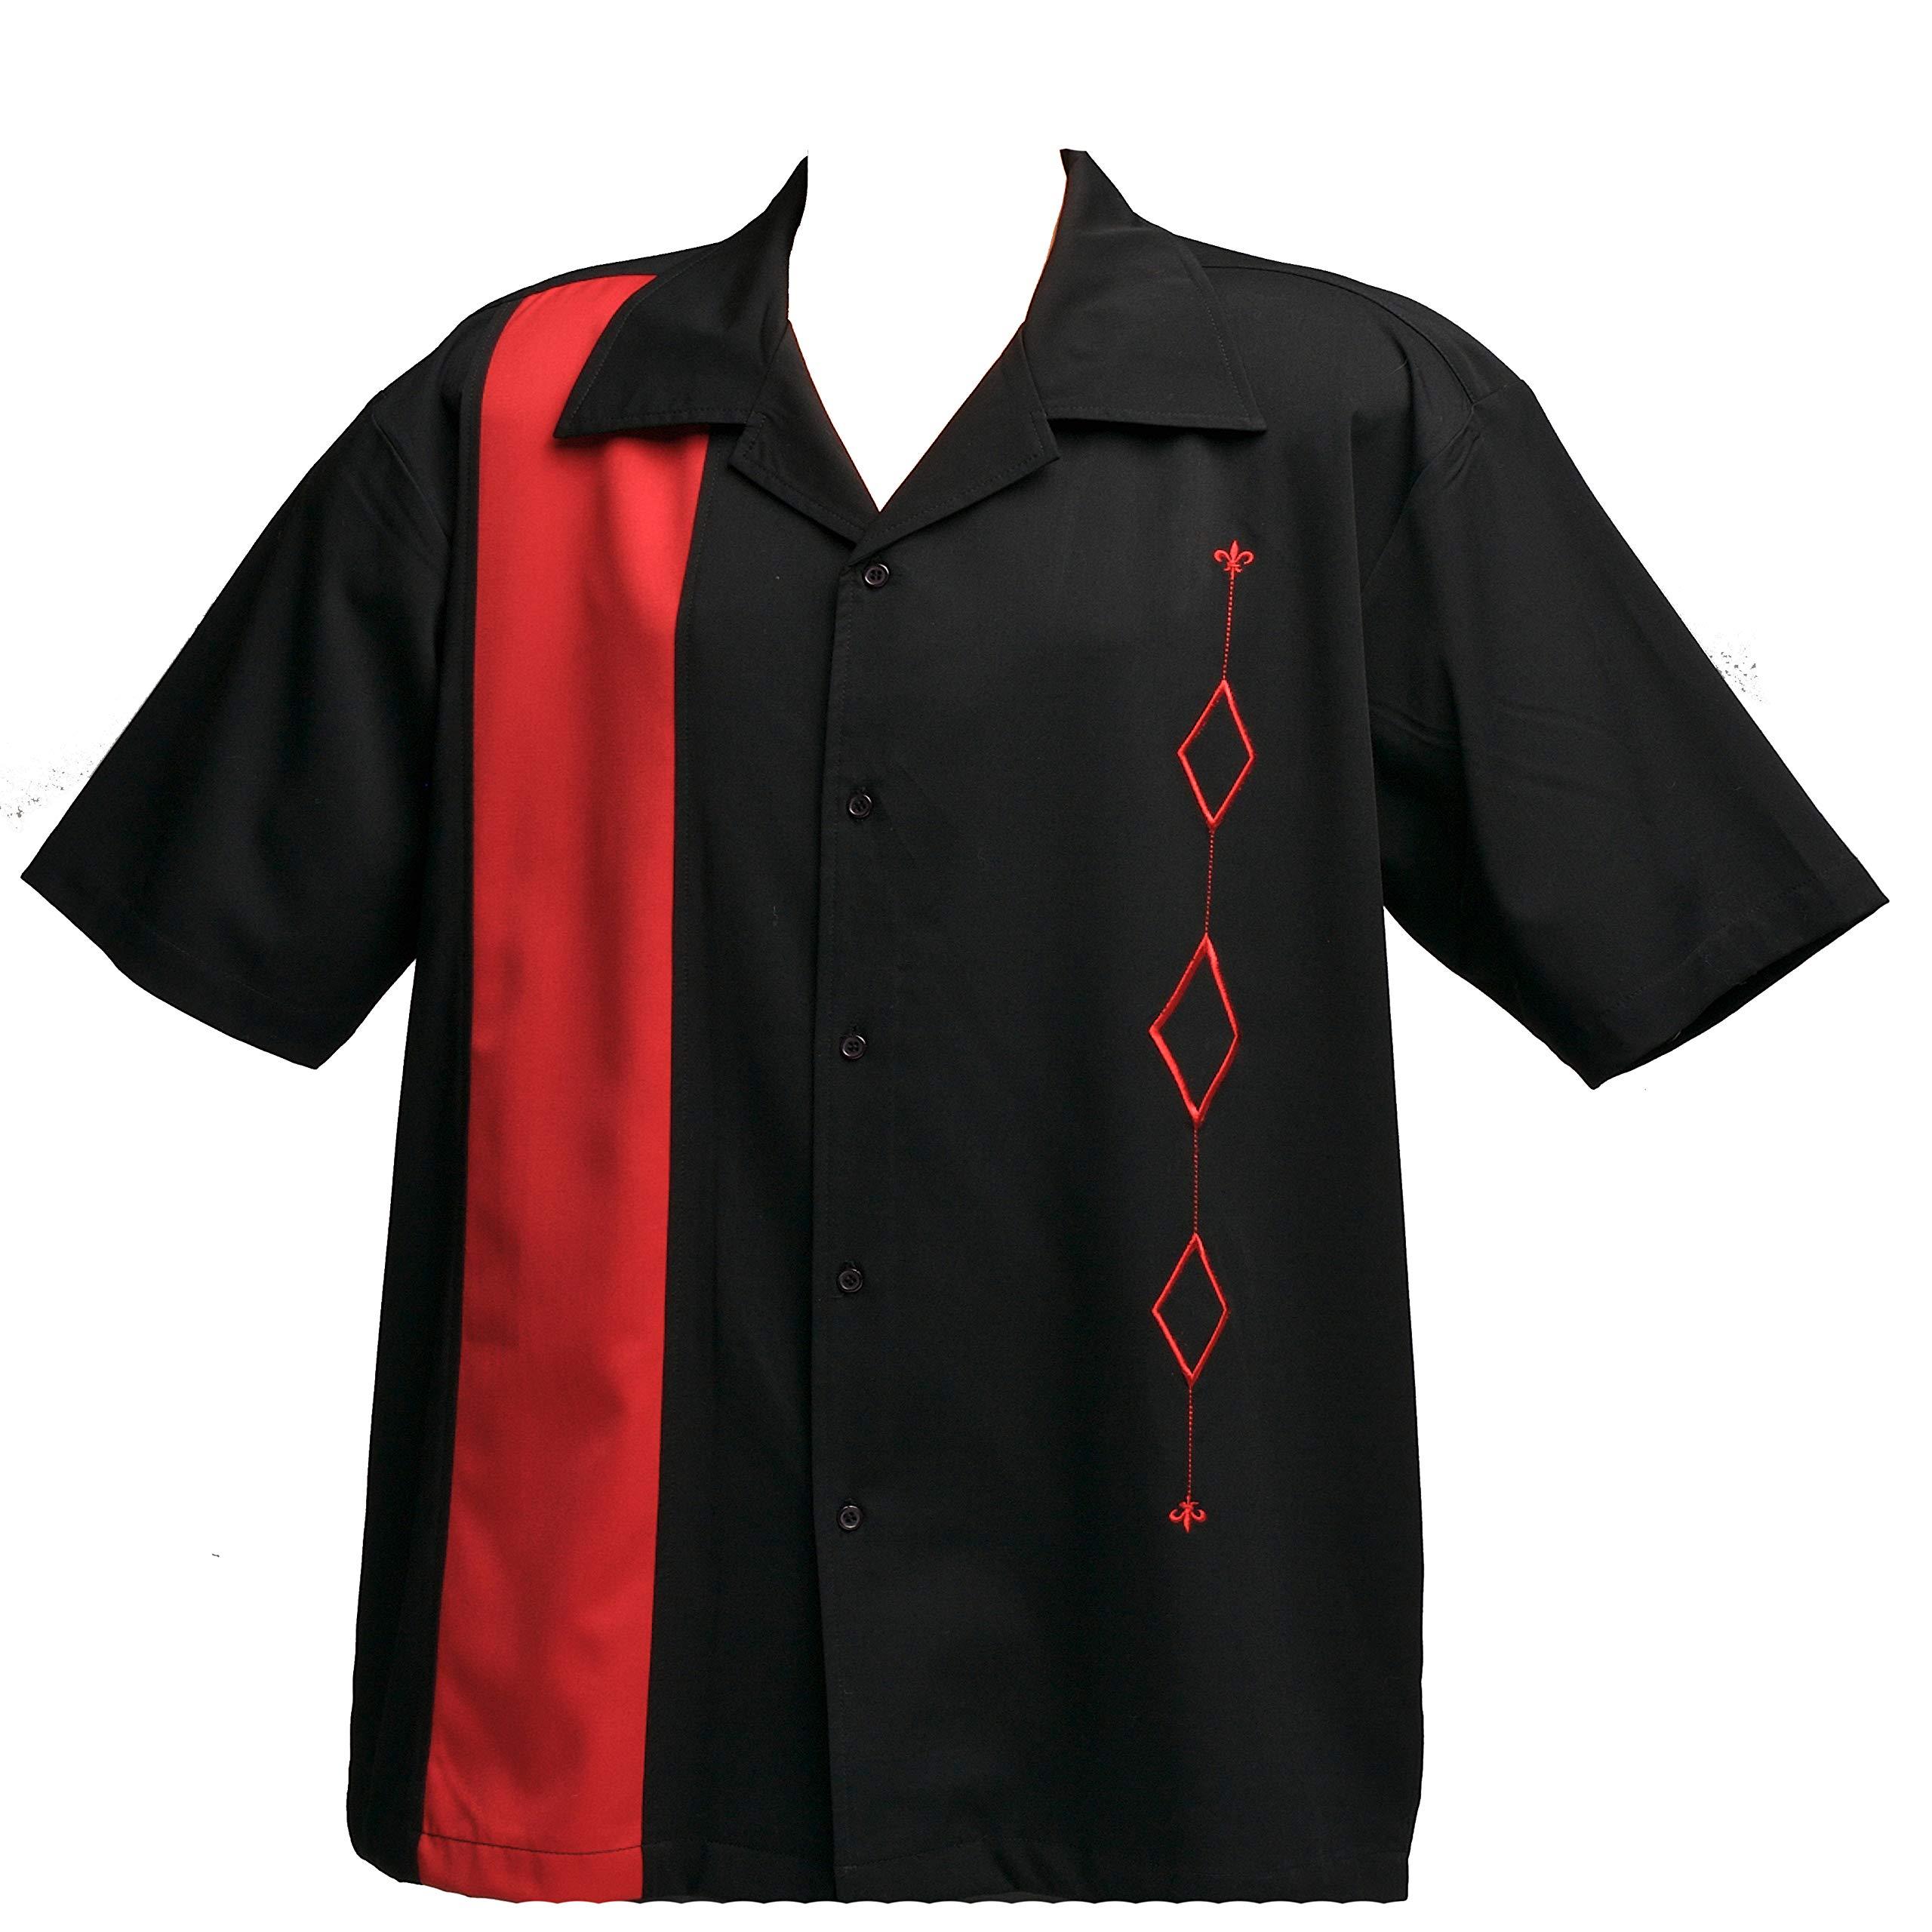 Designs by Attila Mens Retro Bowling Shirt, BIG & TALL. Red & Black, Size XLT